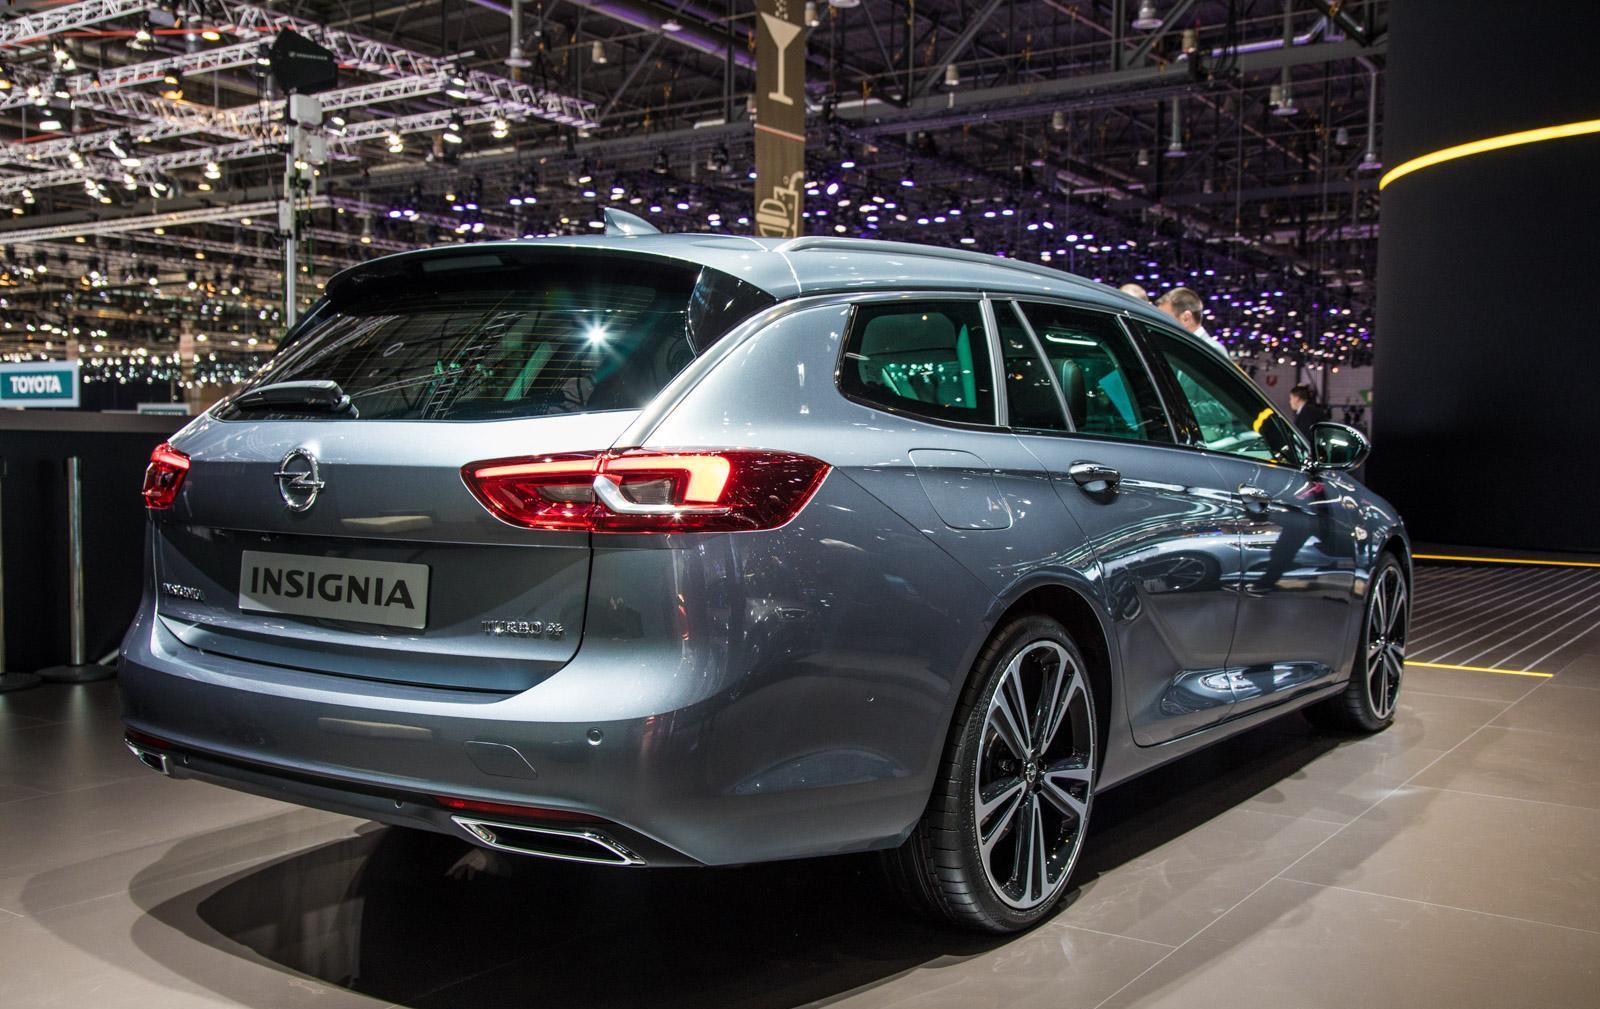 Opel-insignia-004